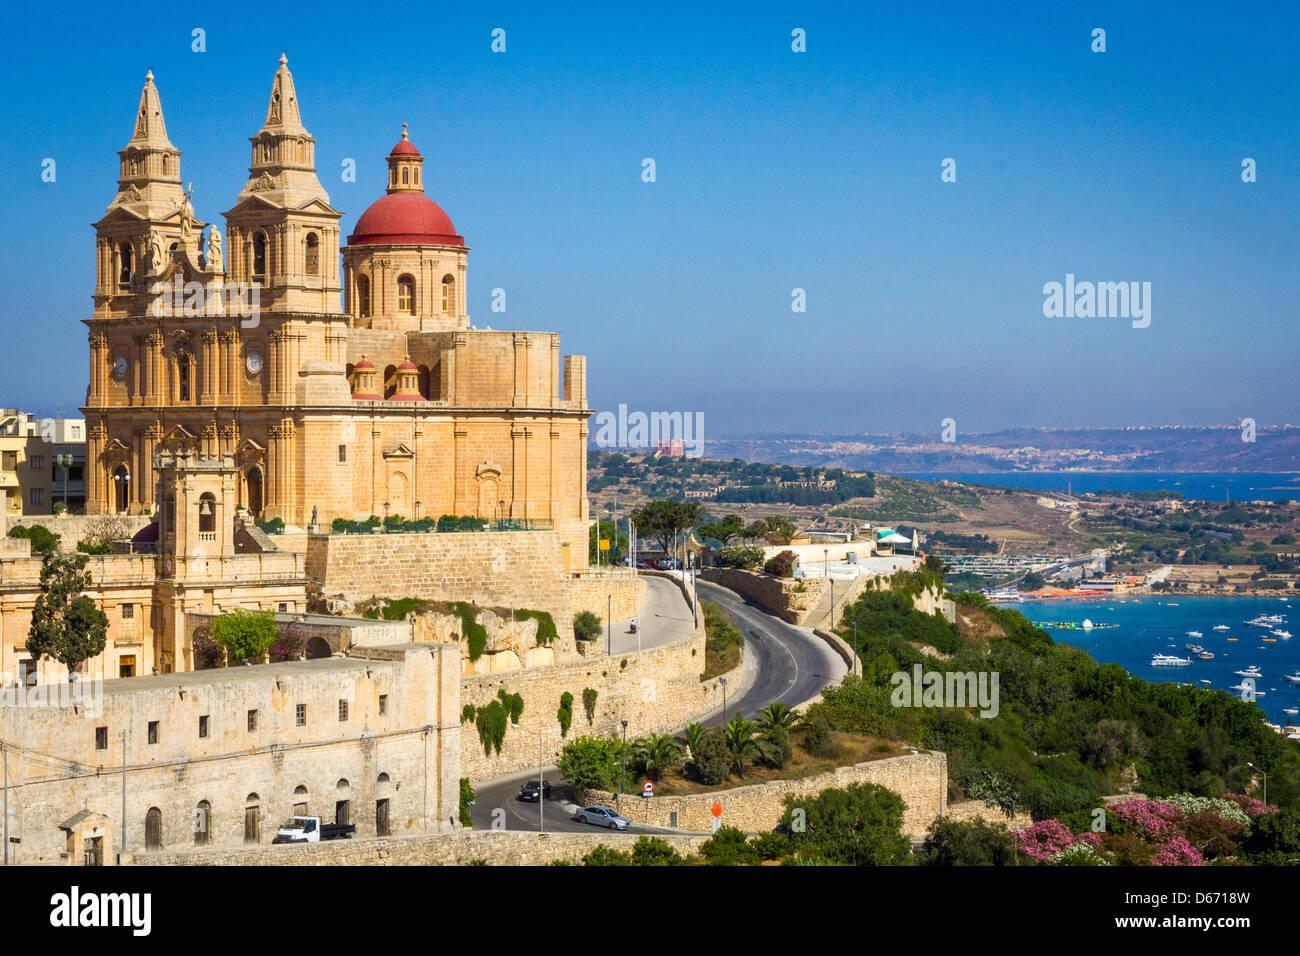 The Mellieha Parish Church in the morning, Malta Stock Photo